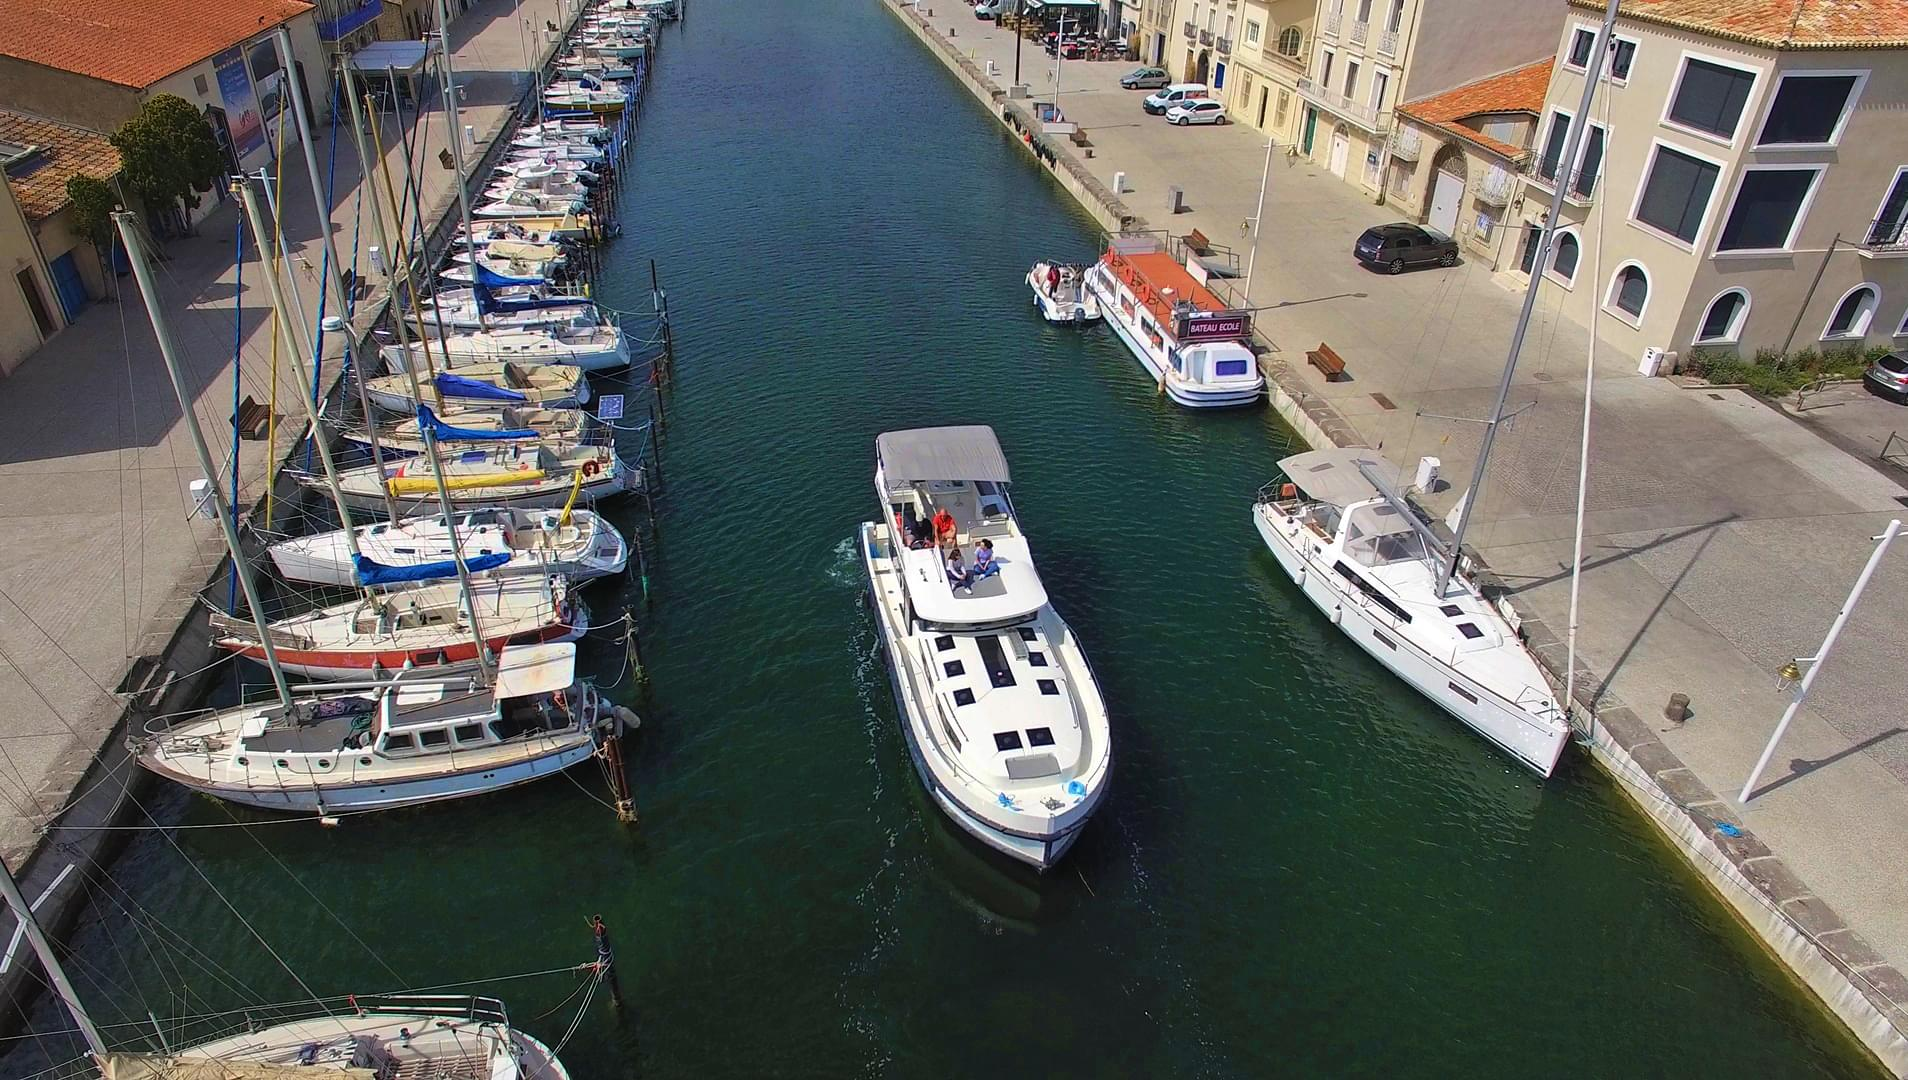 Le Boat image